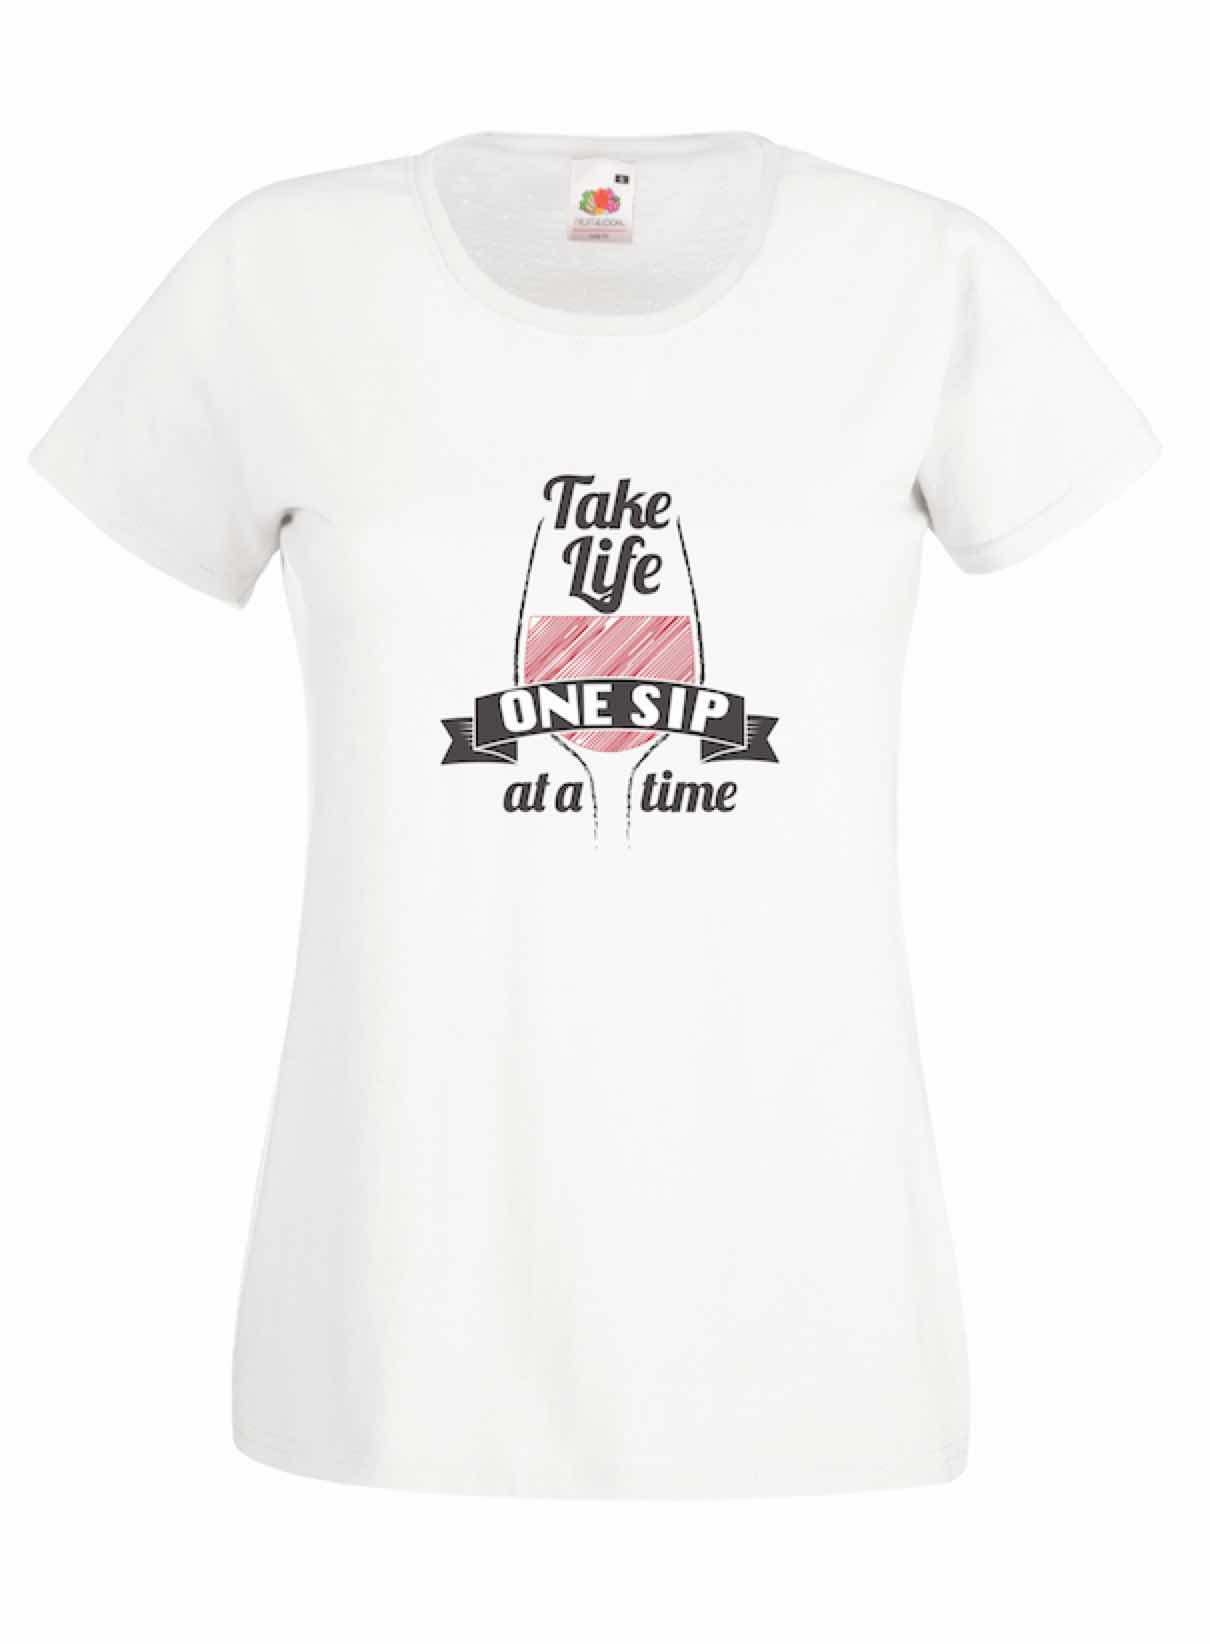 Take Life 1 Sip design for t-shirt, hoodie & sweatshirt